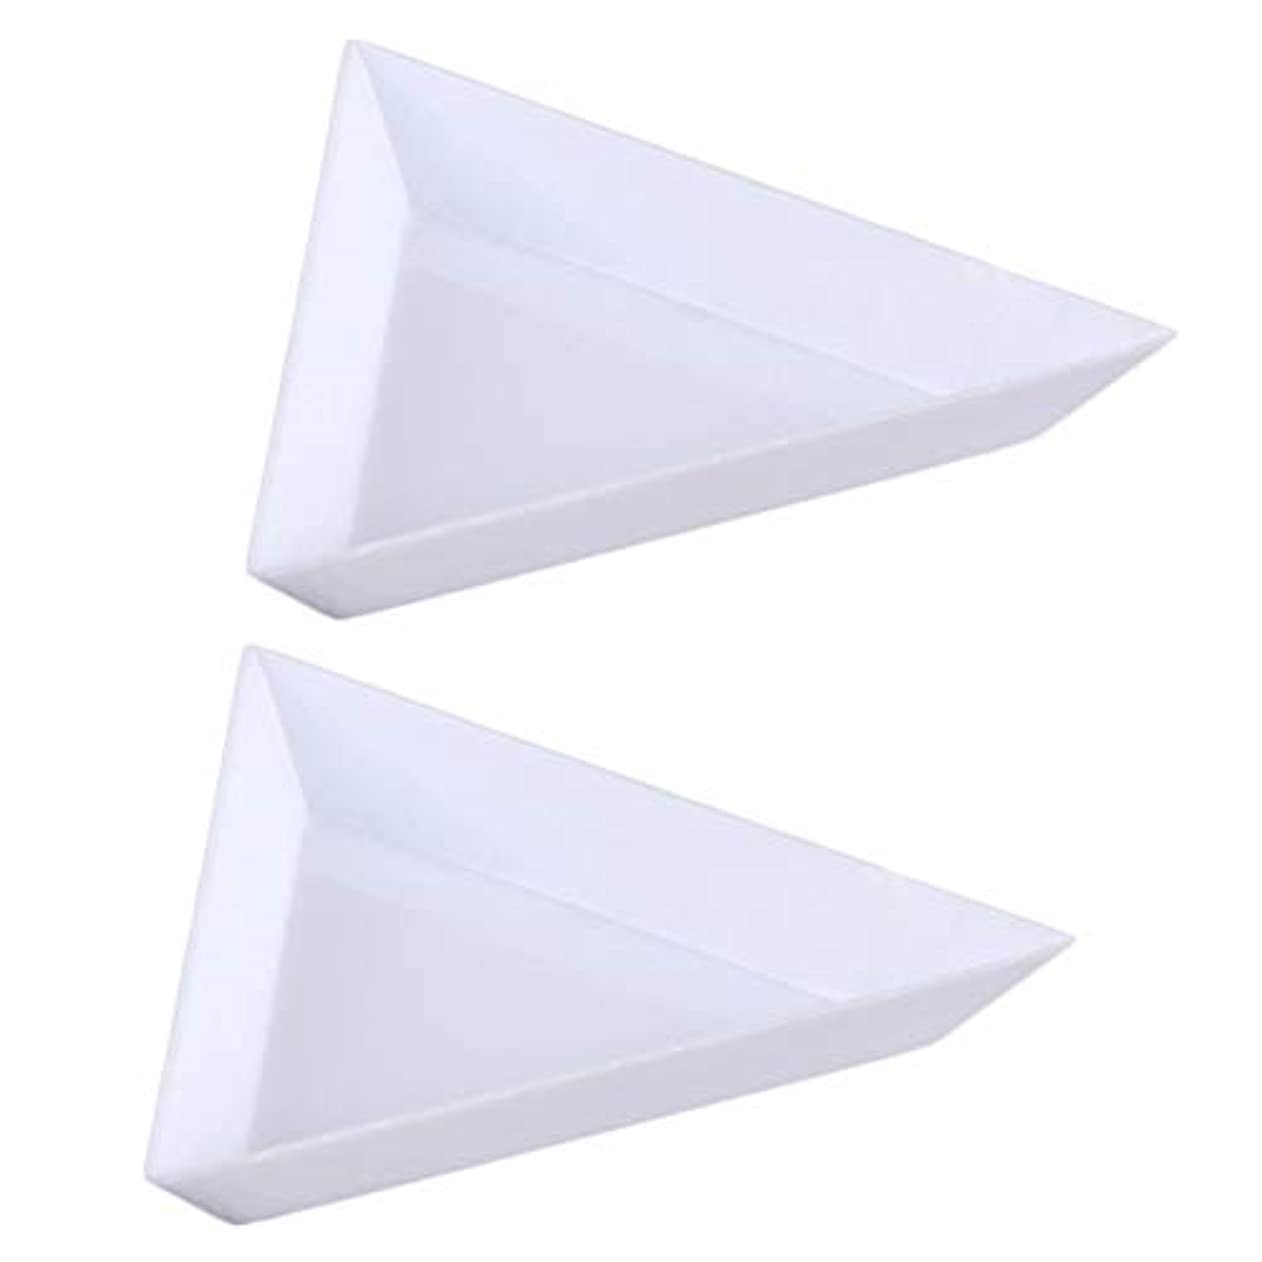 RETYLY 10個三角コーナープラスチックラインストーンビーズ 結晶 ネイルアートソーティングトレイアクセサリー白 DiyネイルアートデコレーションDotting収納トレイ オーガニゼーションに最適